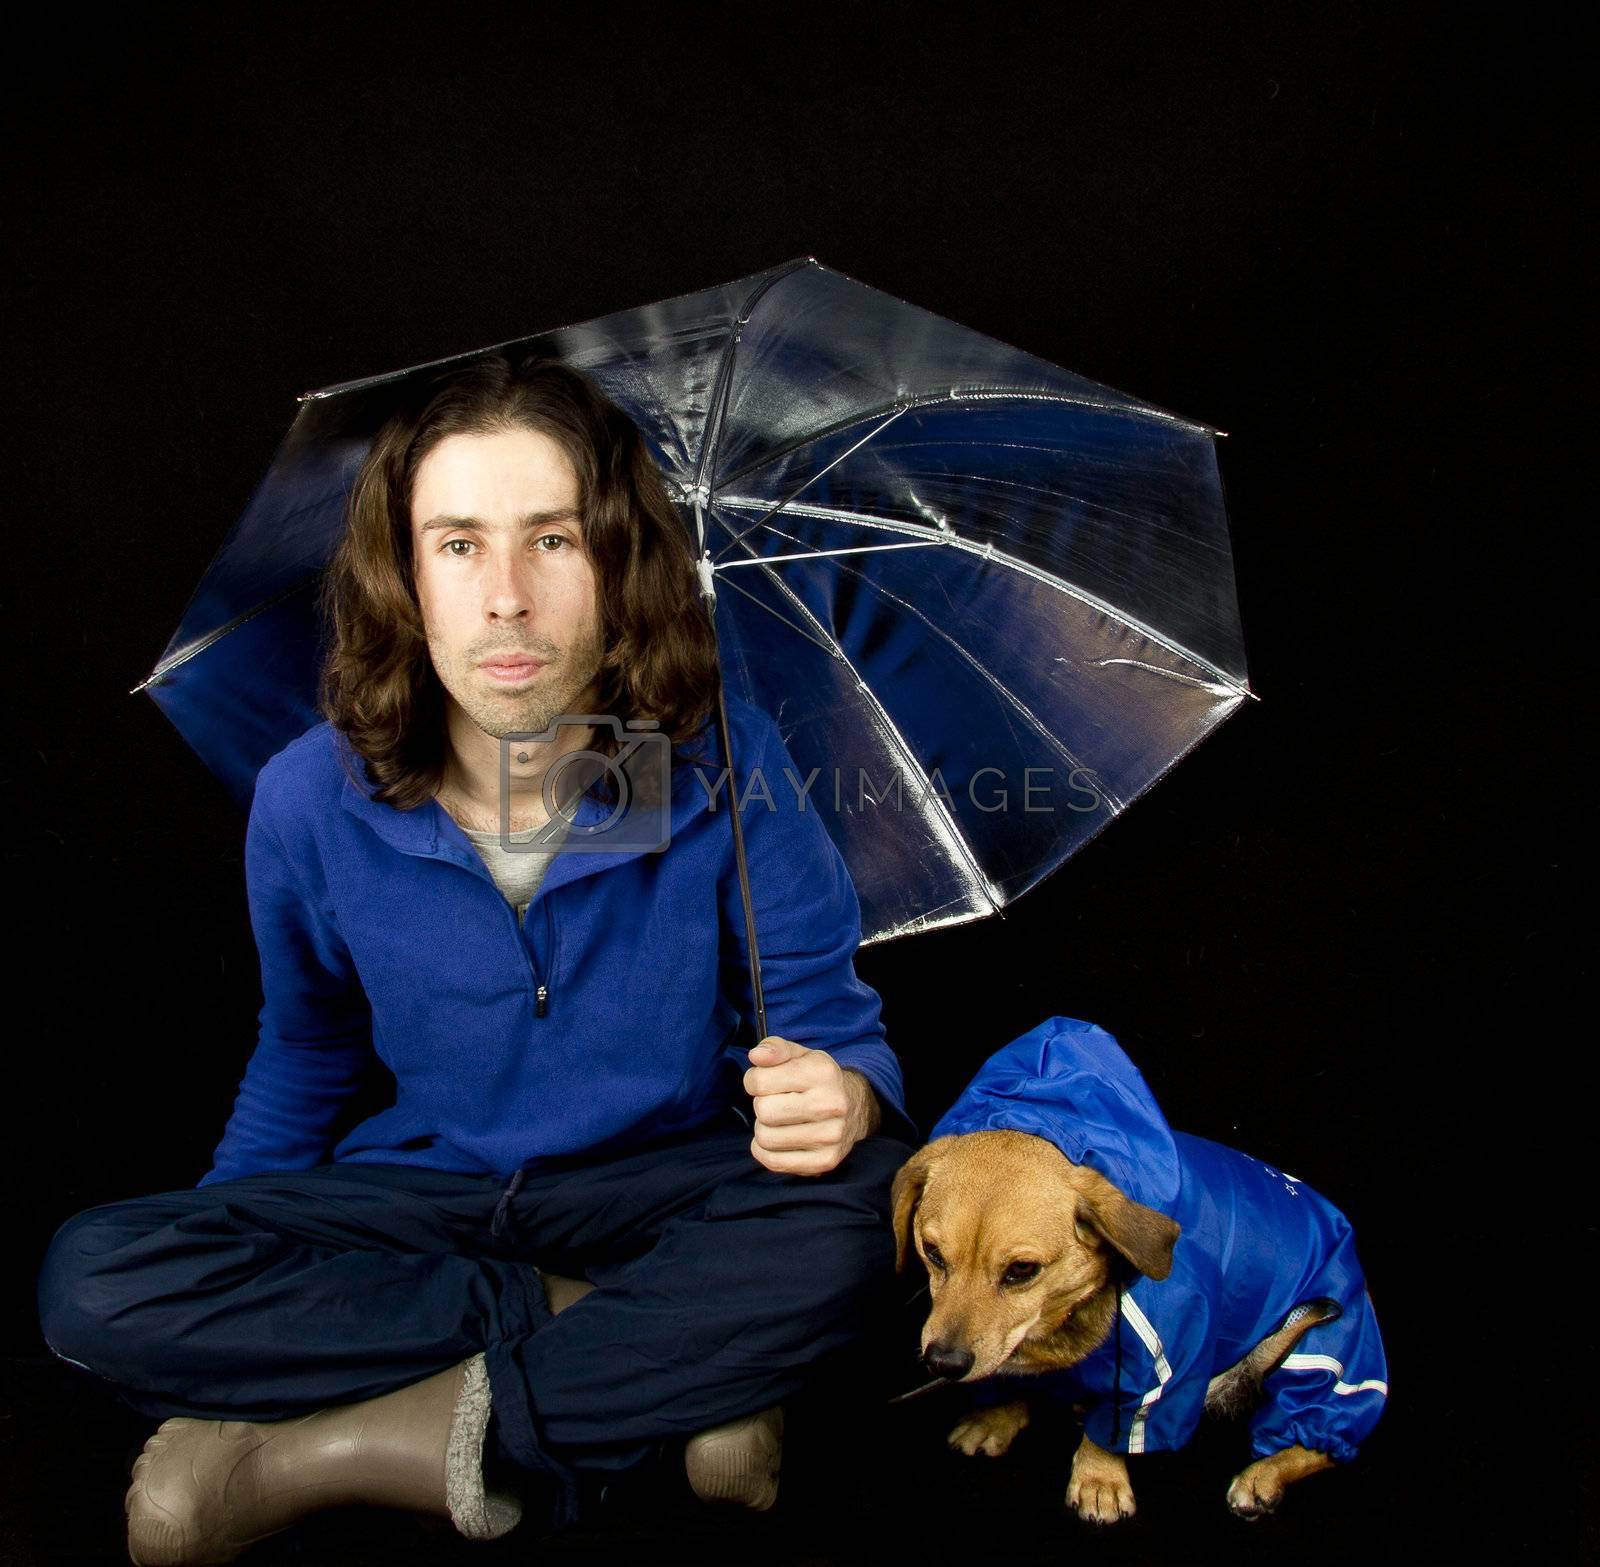 the blue rain dog and master